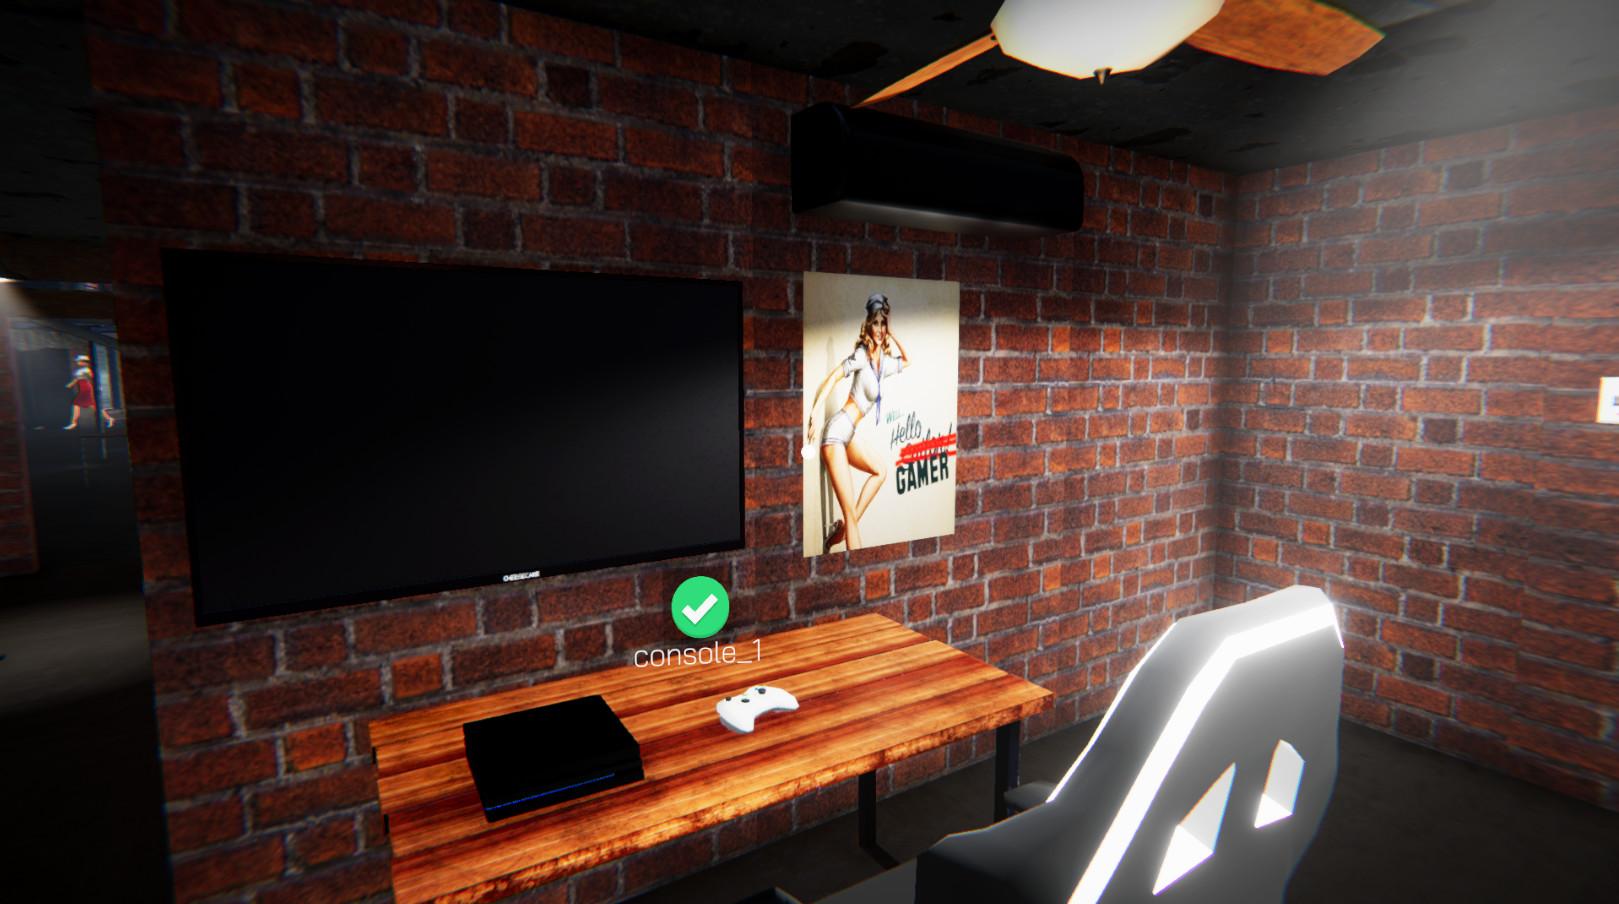 网吧模拟器/网咖模拟器/Internet Cafe Simulator插图3